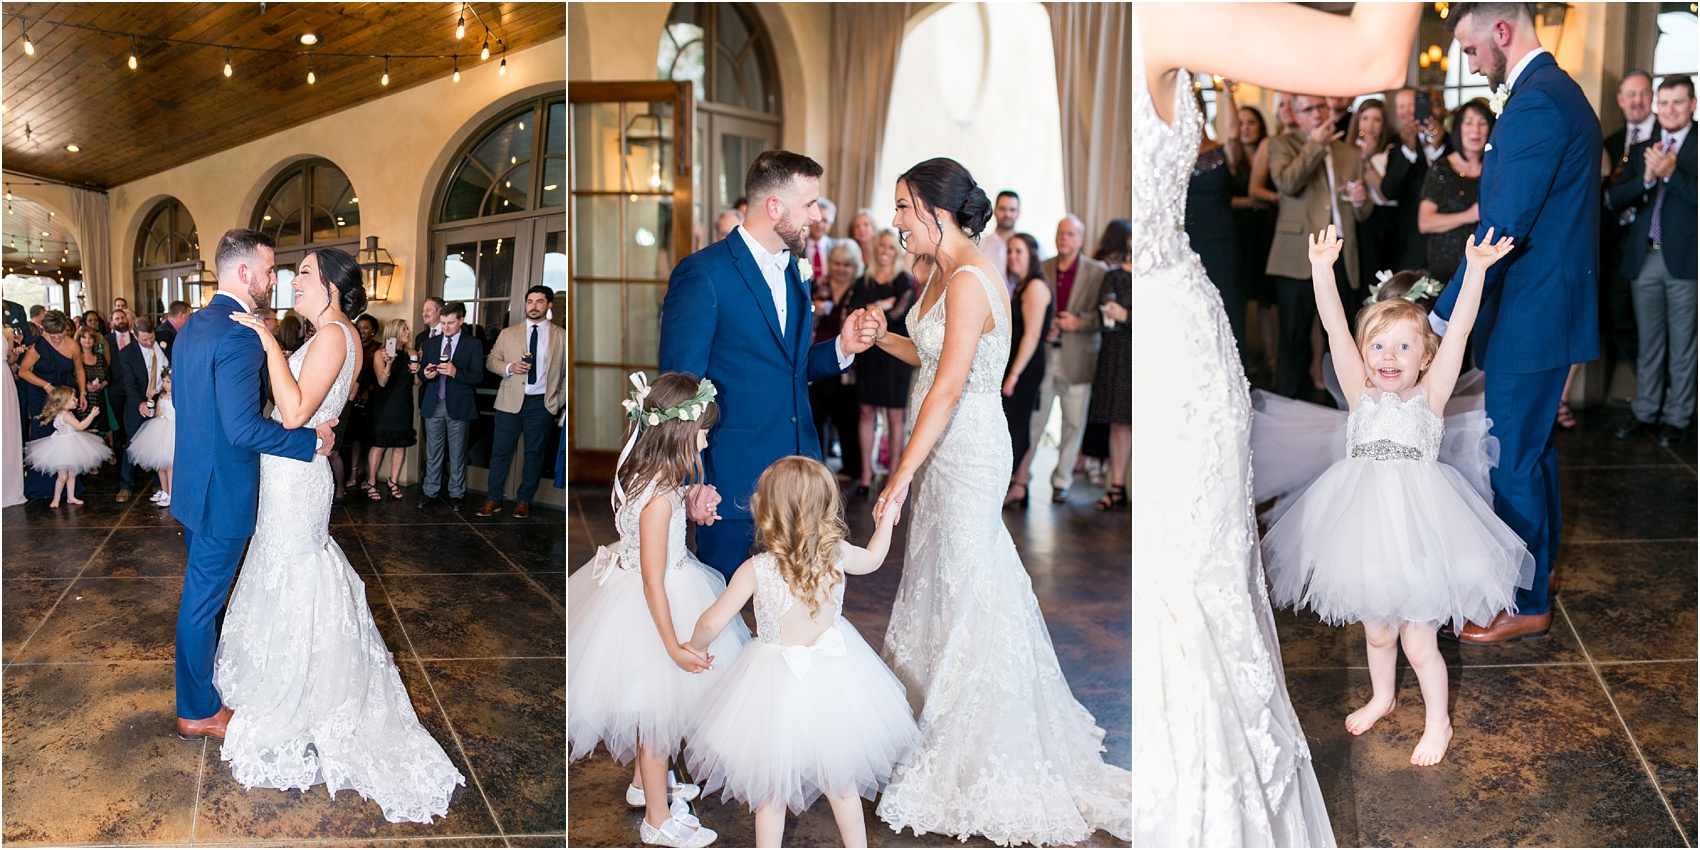 Savannah Eve Photography- Turnbill-Gilgan Wedding- Blog-71.jpg